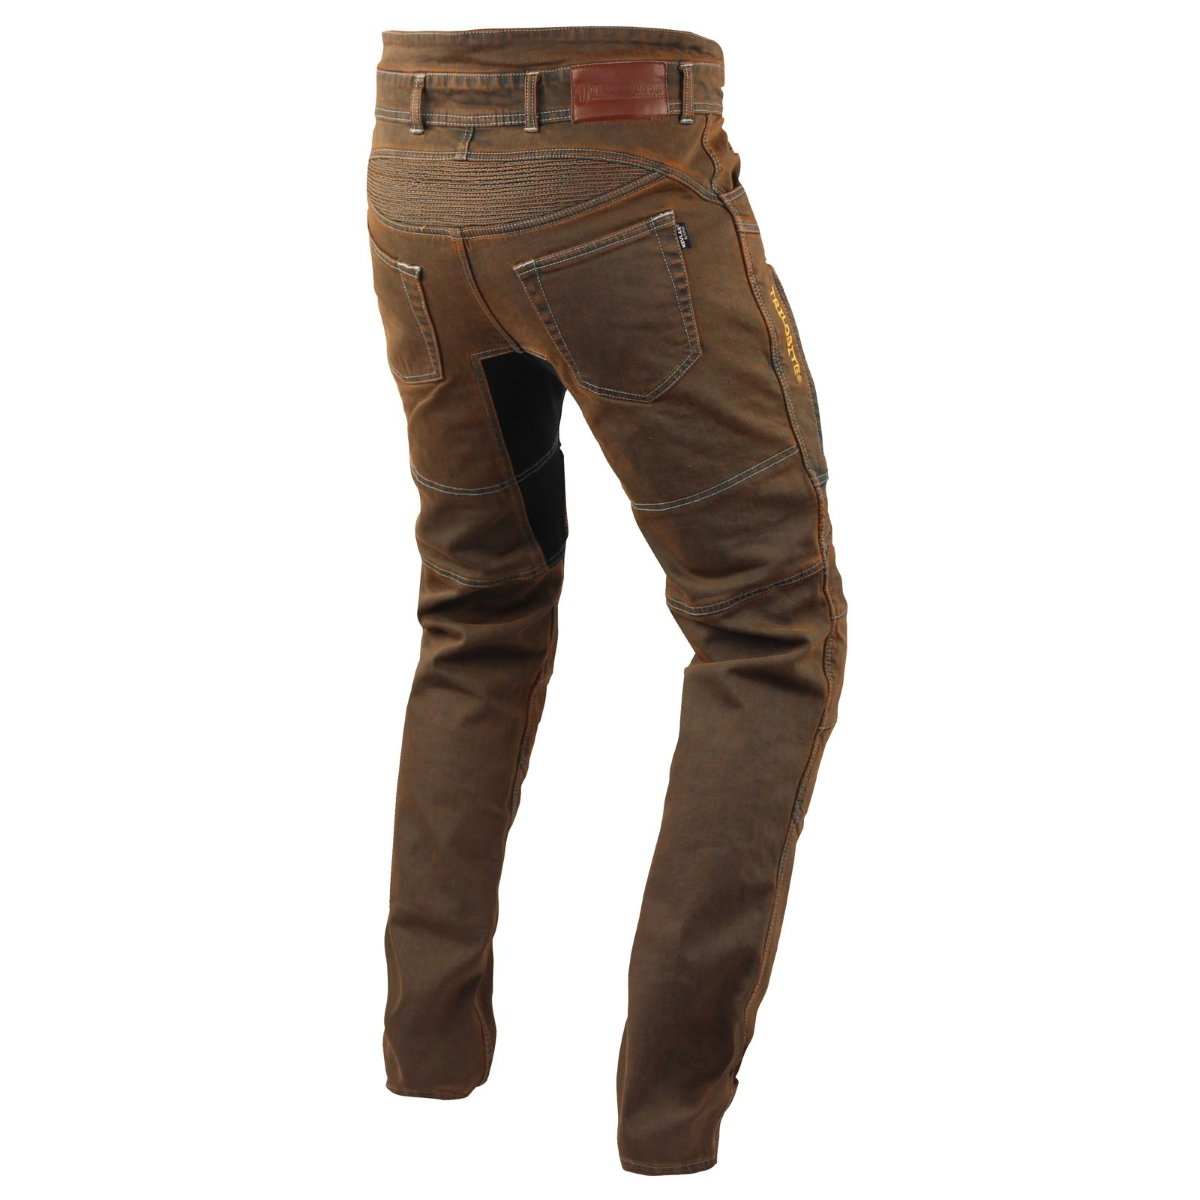 trilobite parado motorrad jeans herren braun wild wear 189 00. Black Bedroom Furniture Sets. Home Design Ideas